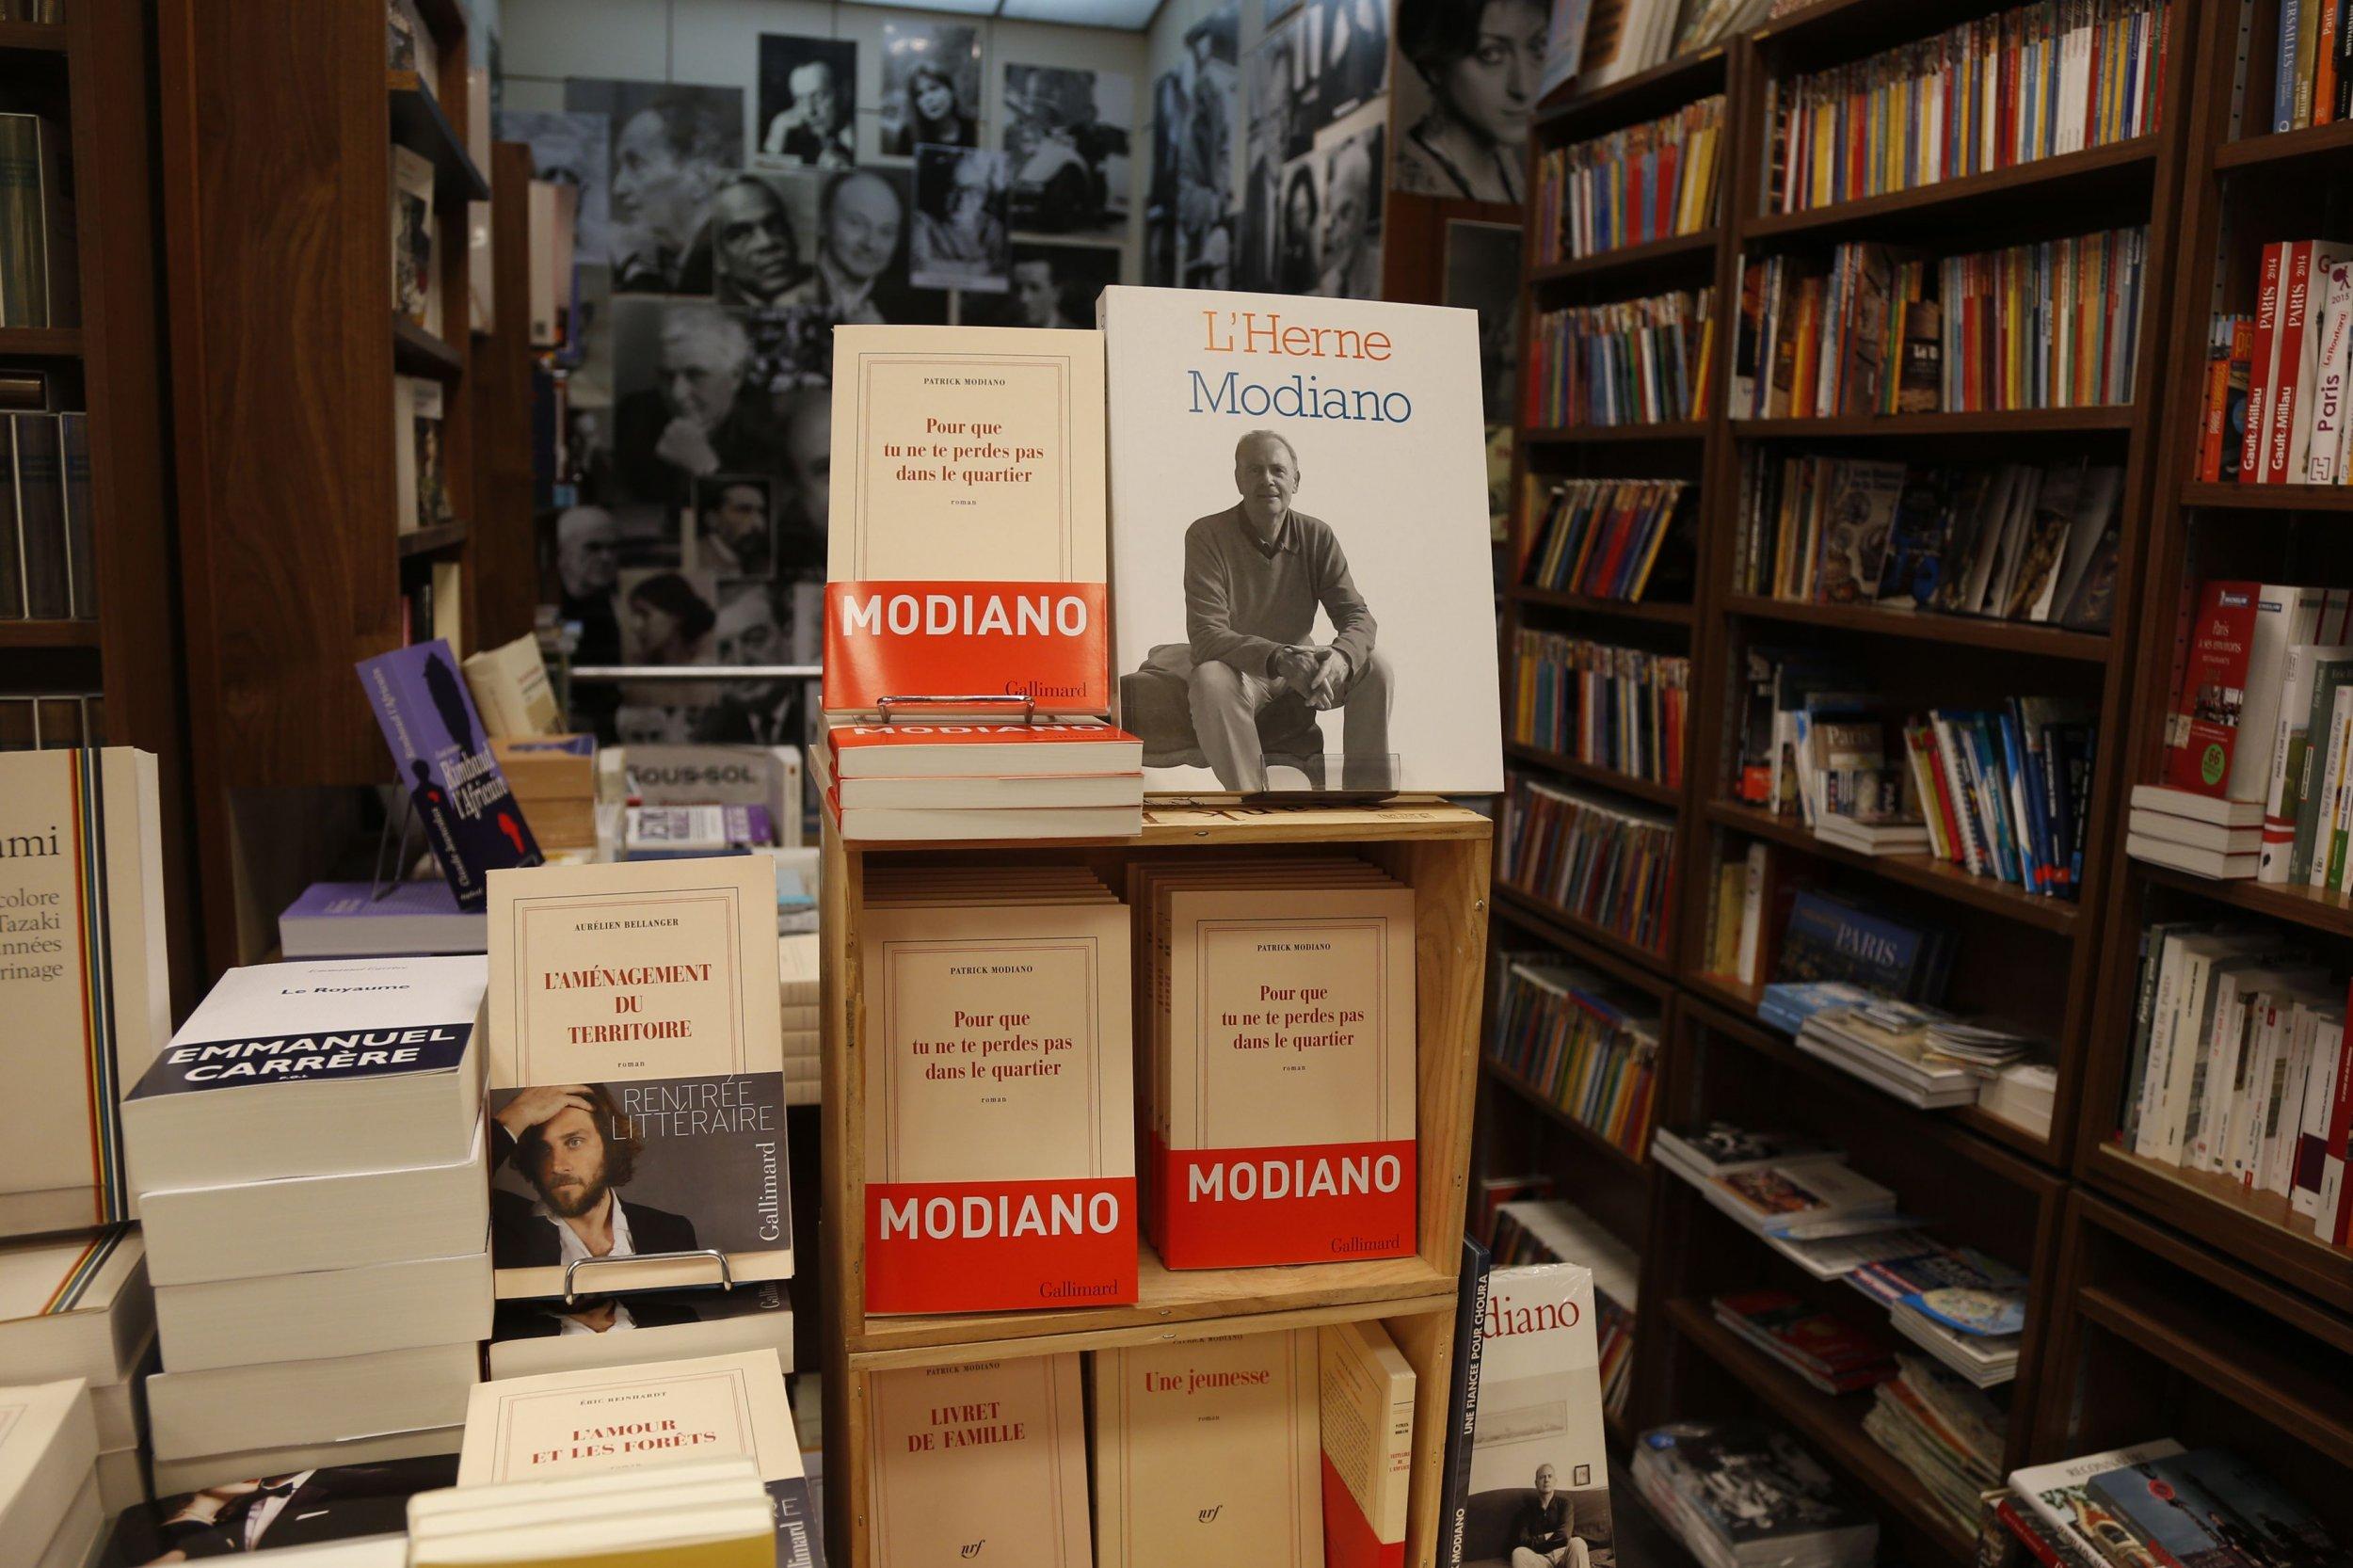 10-9-14 Nobel Prize literature